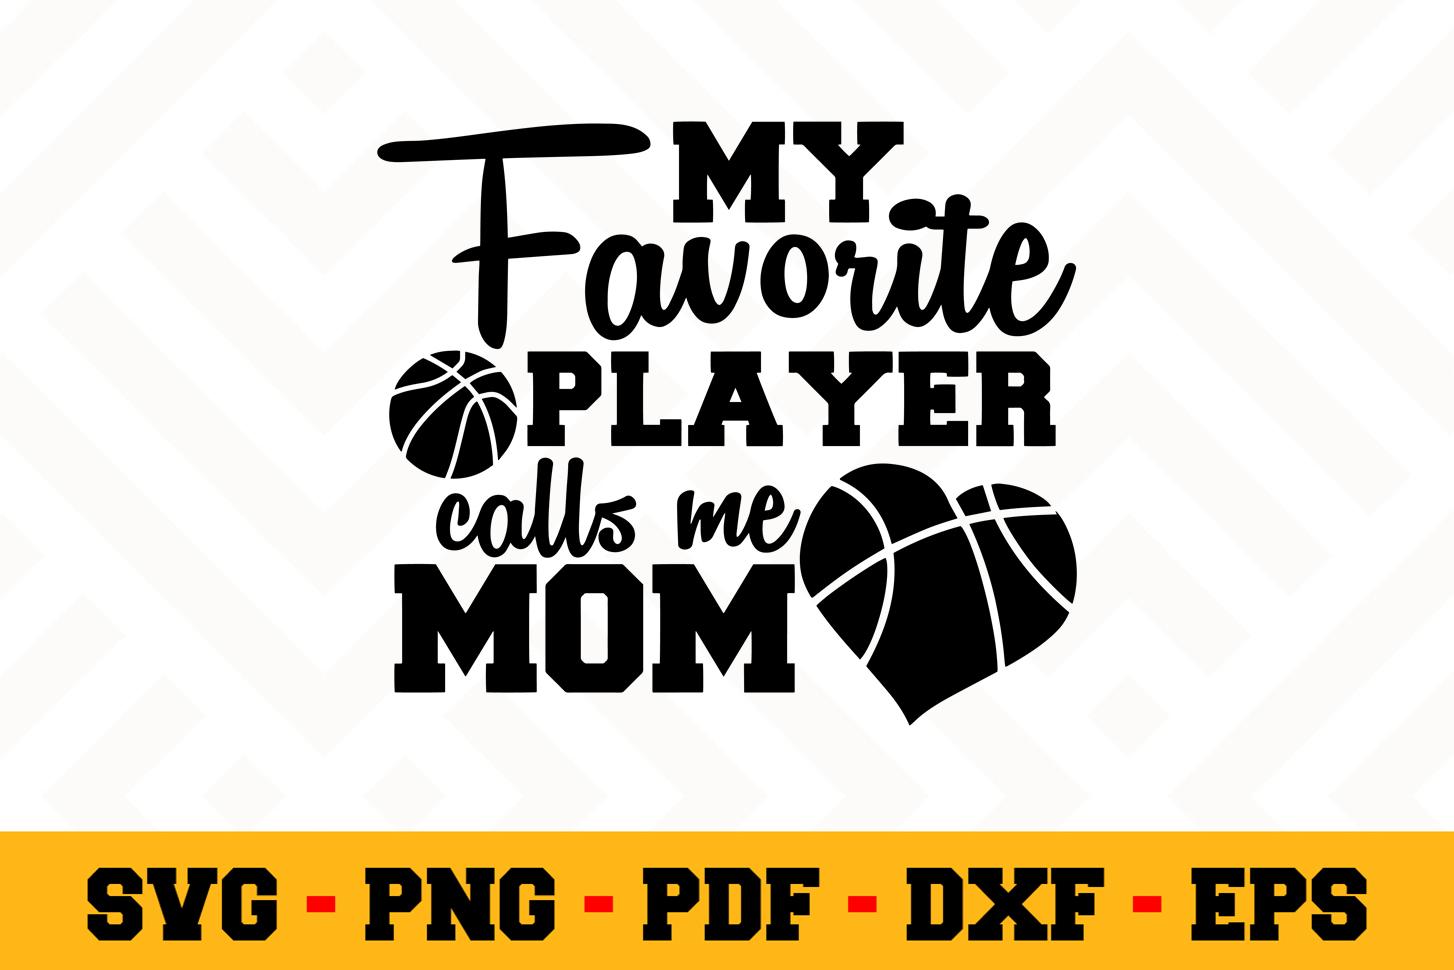 Basketball SVG Design n565 | Basketball SVG Cut File example image 1